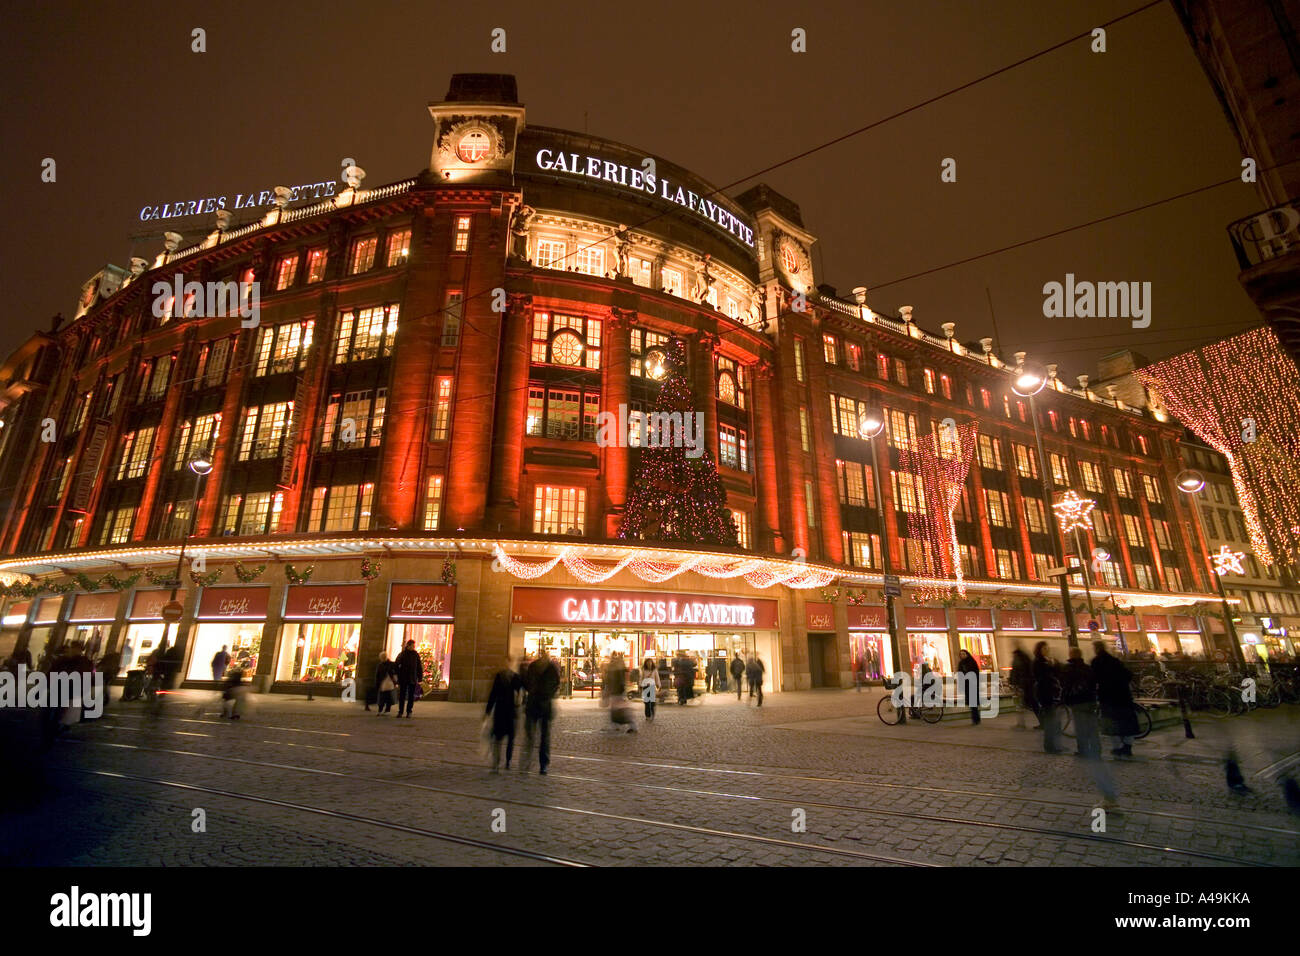 Galeries Lafayette / Strasbourg Stock Photo - Alamy